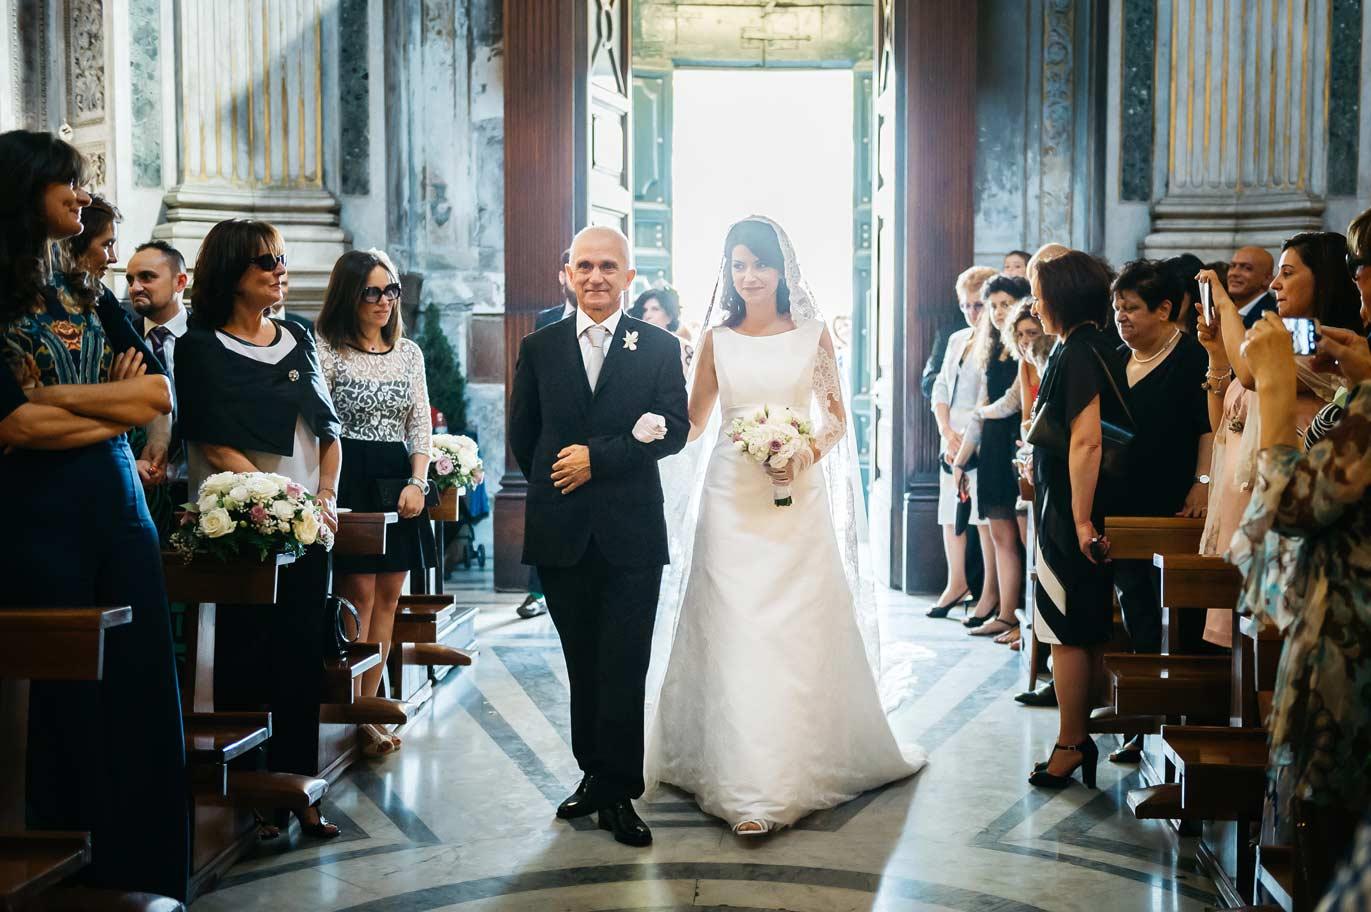 Fotografo-Sposi-Roma-Cerimonia